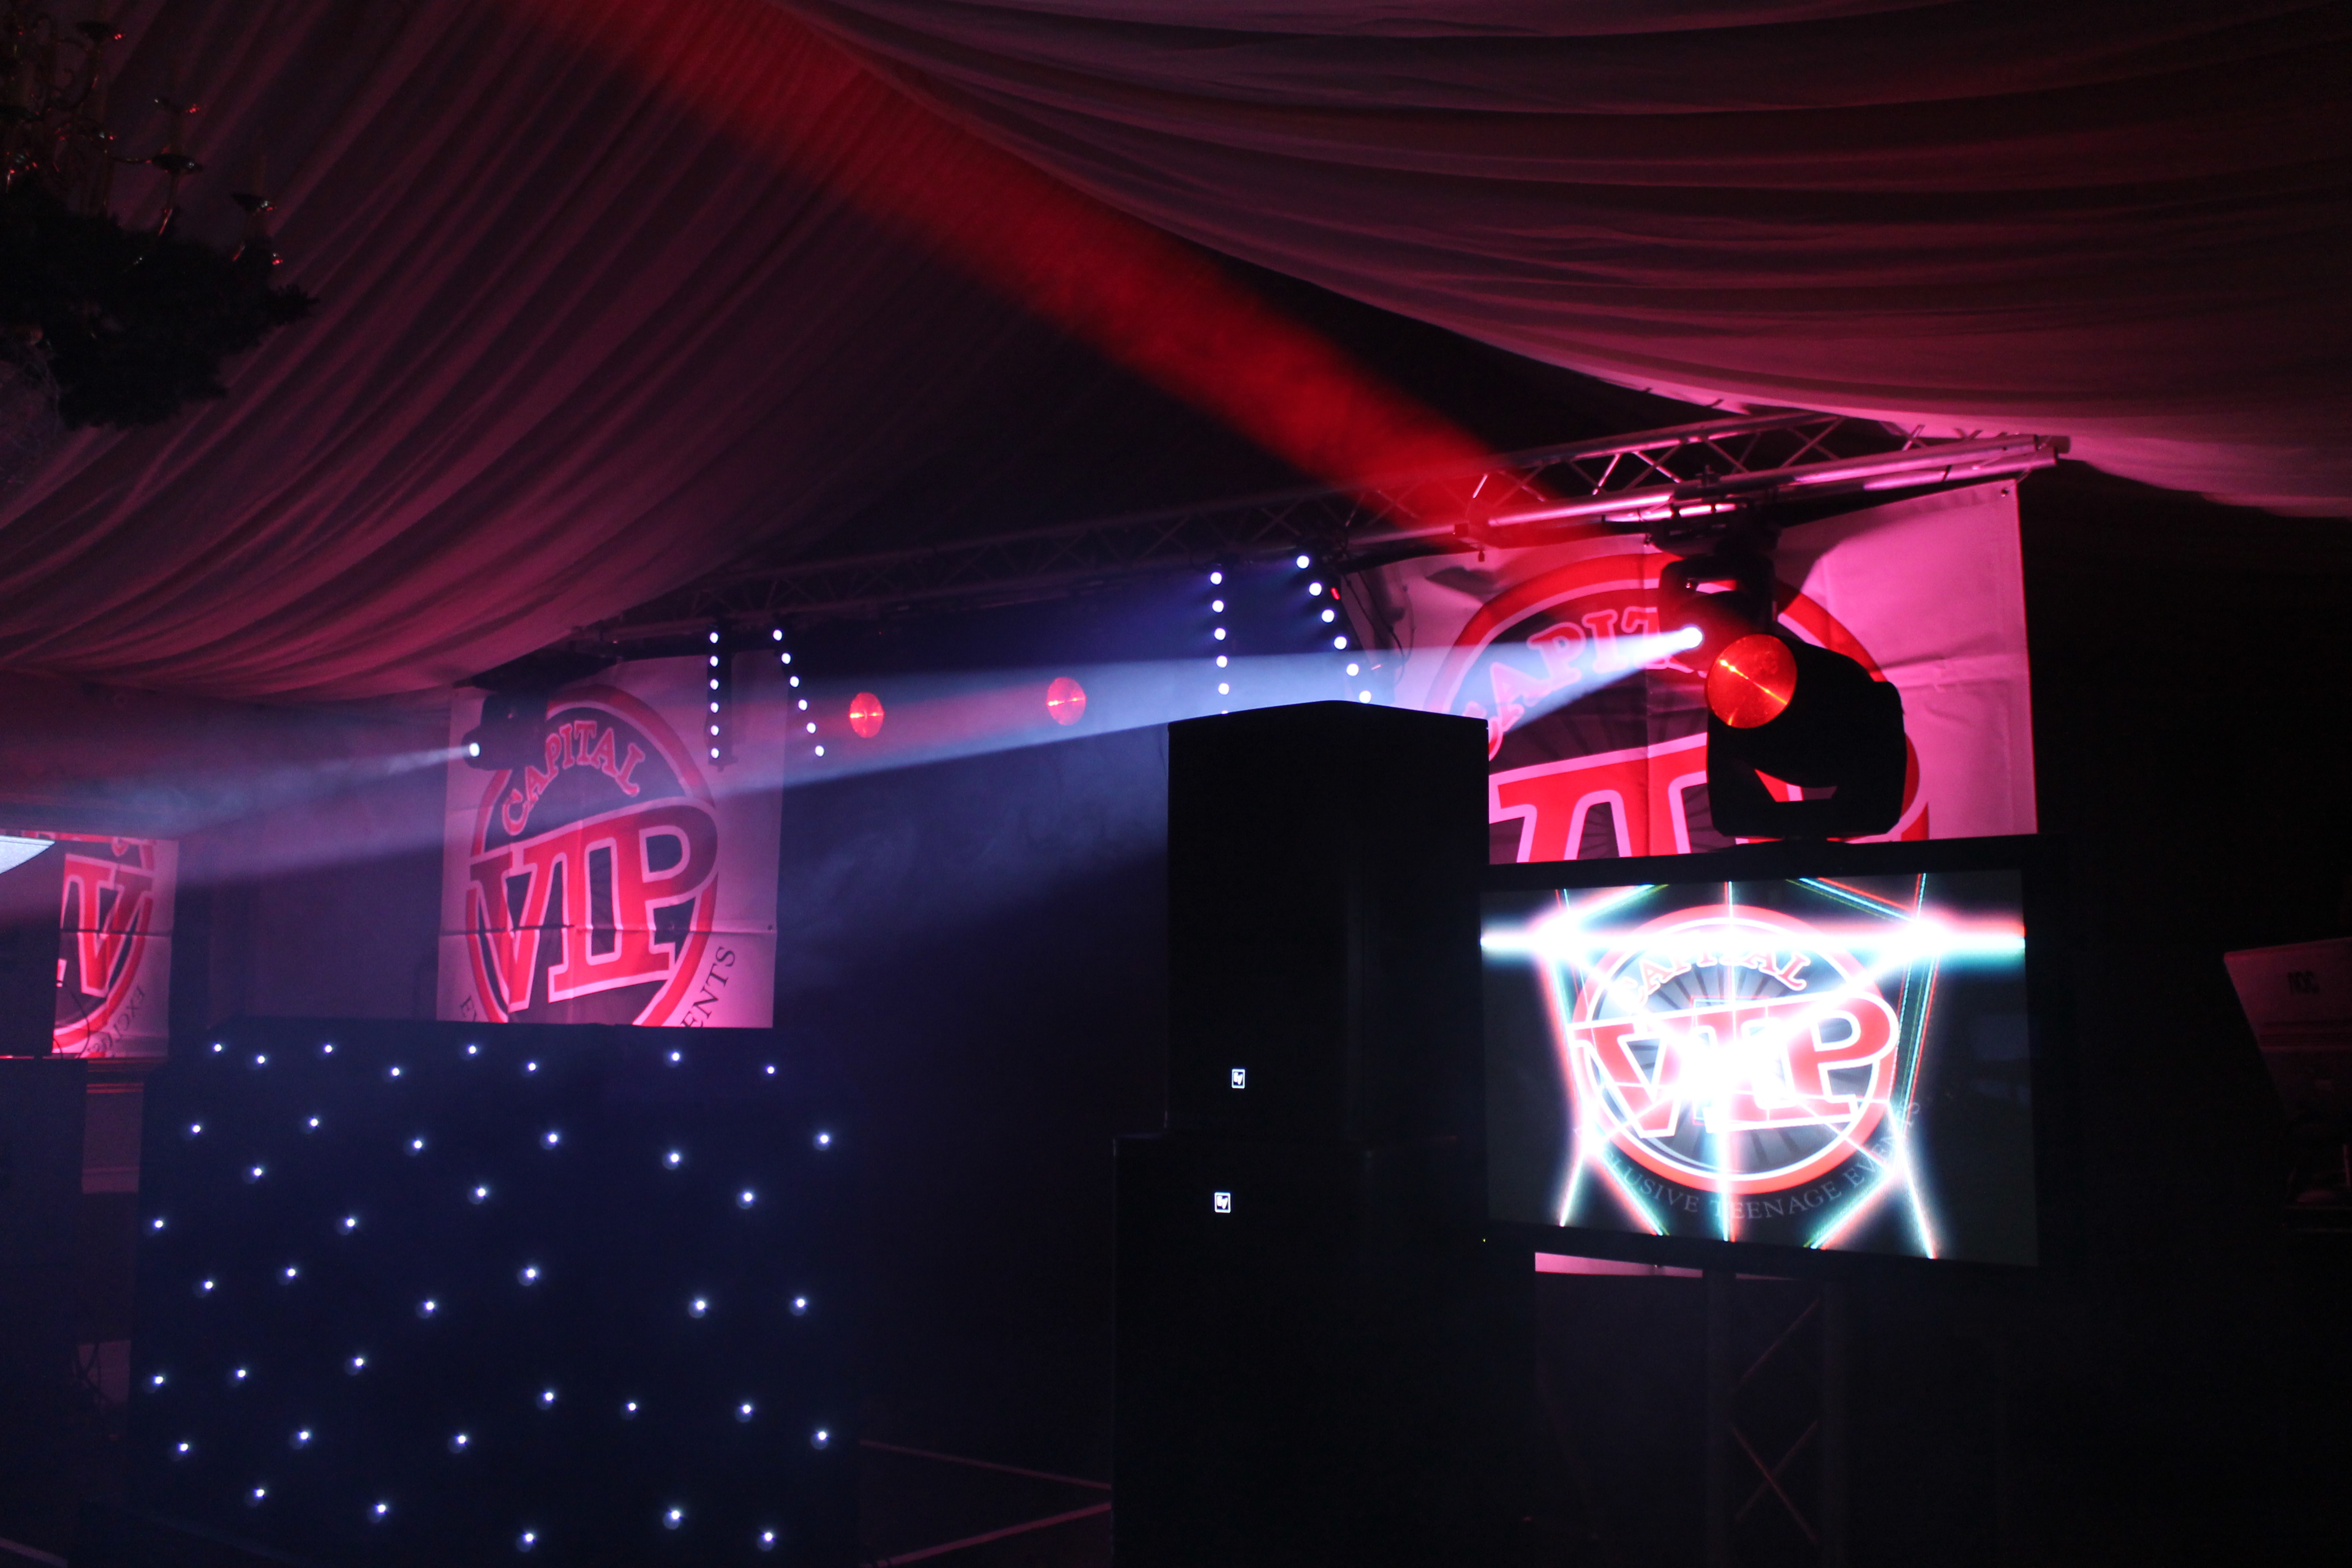 lighting hire event lighting company cambridge london uk